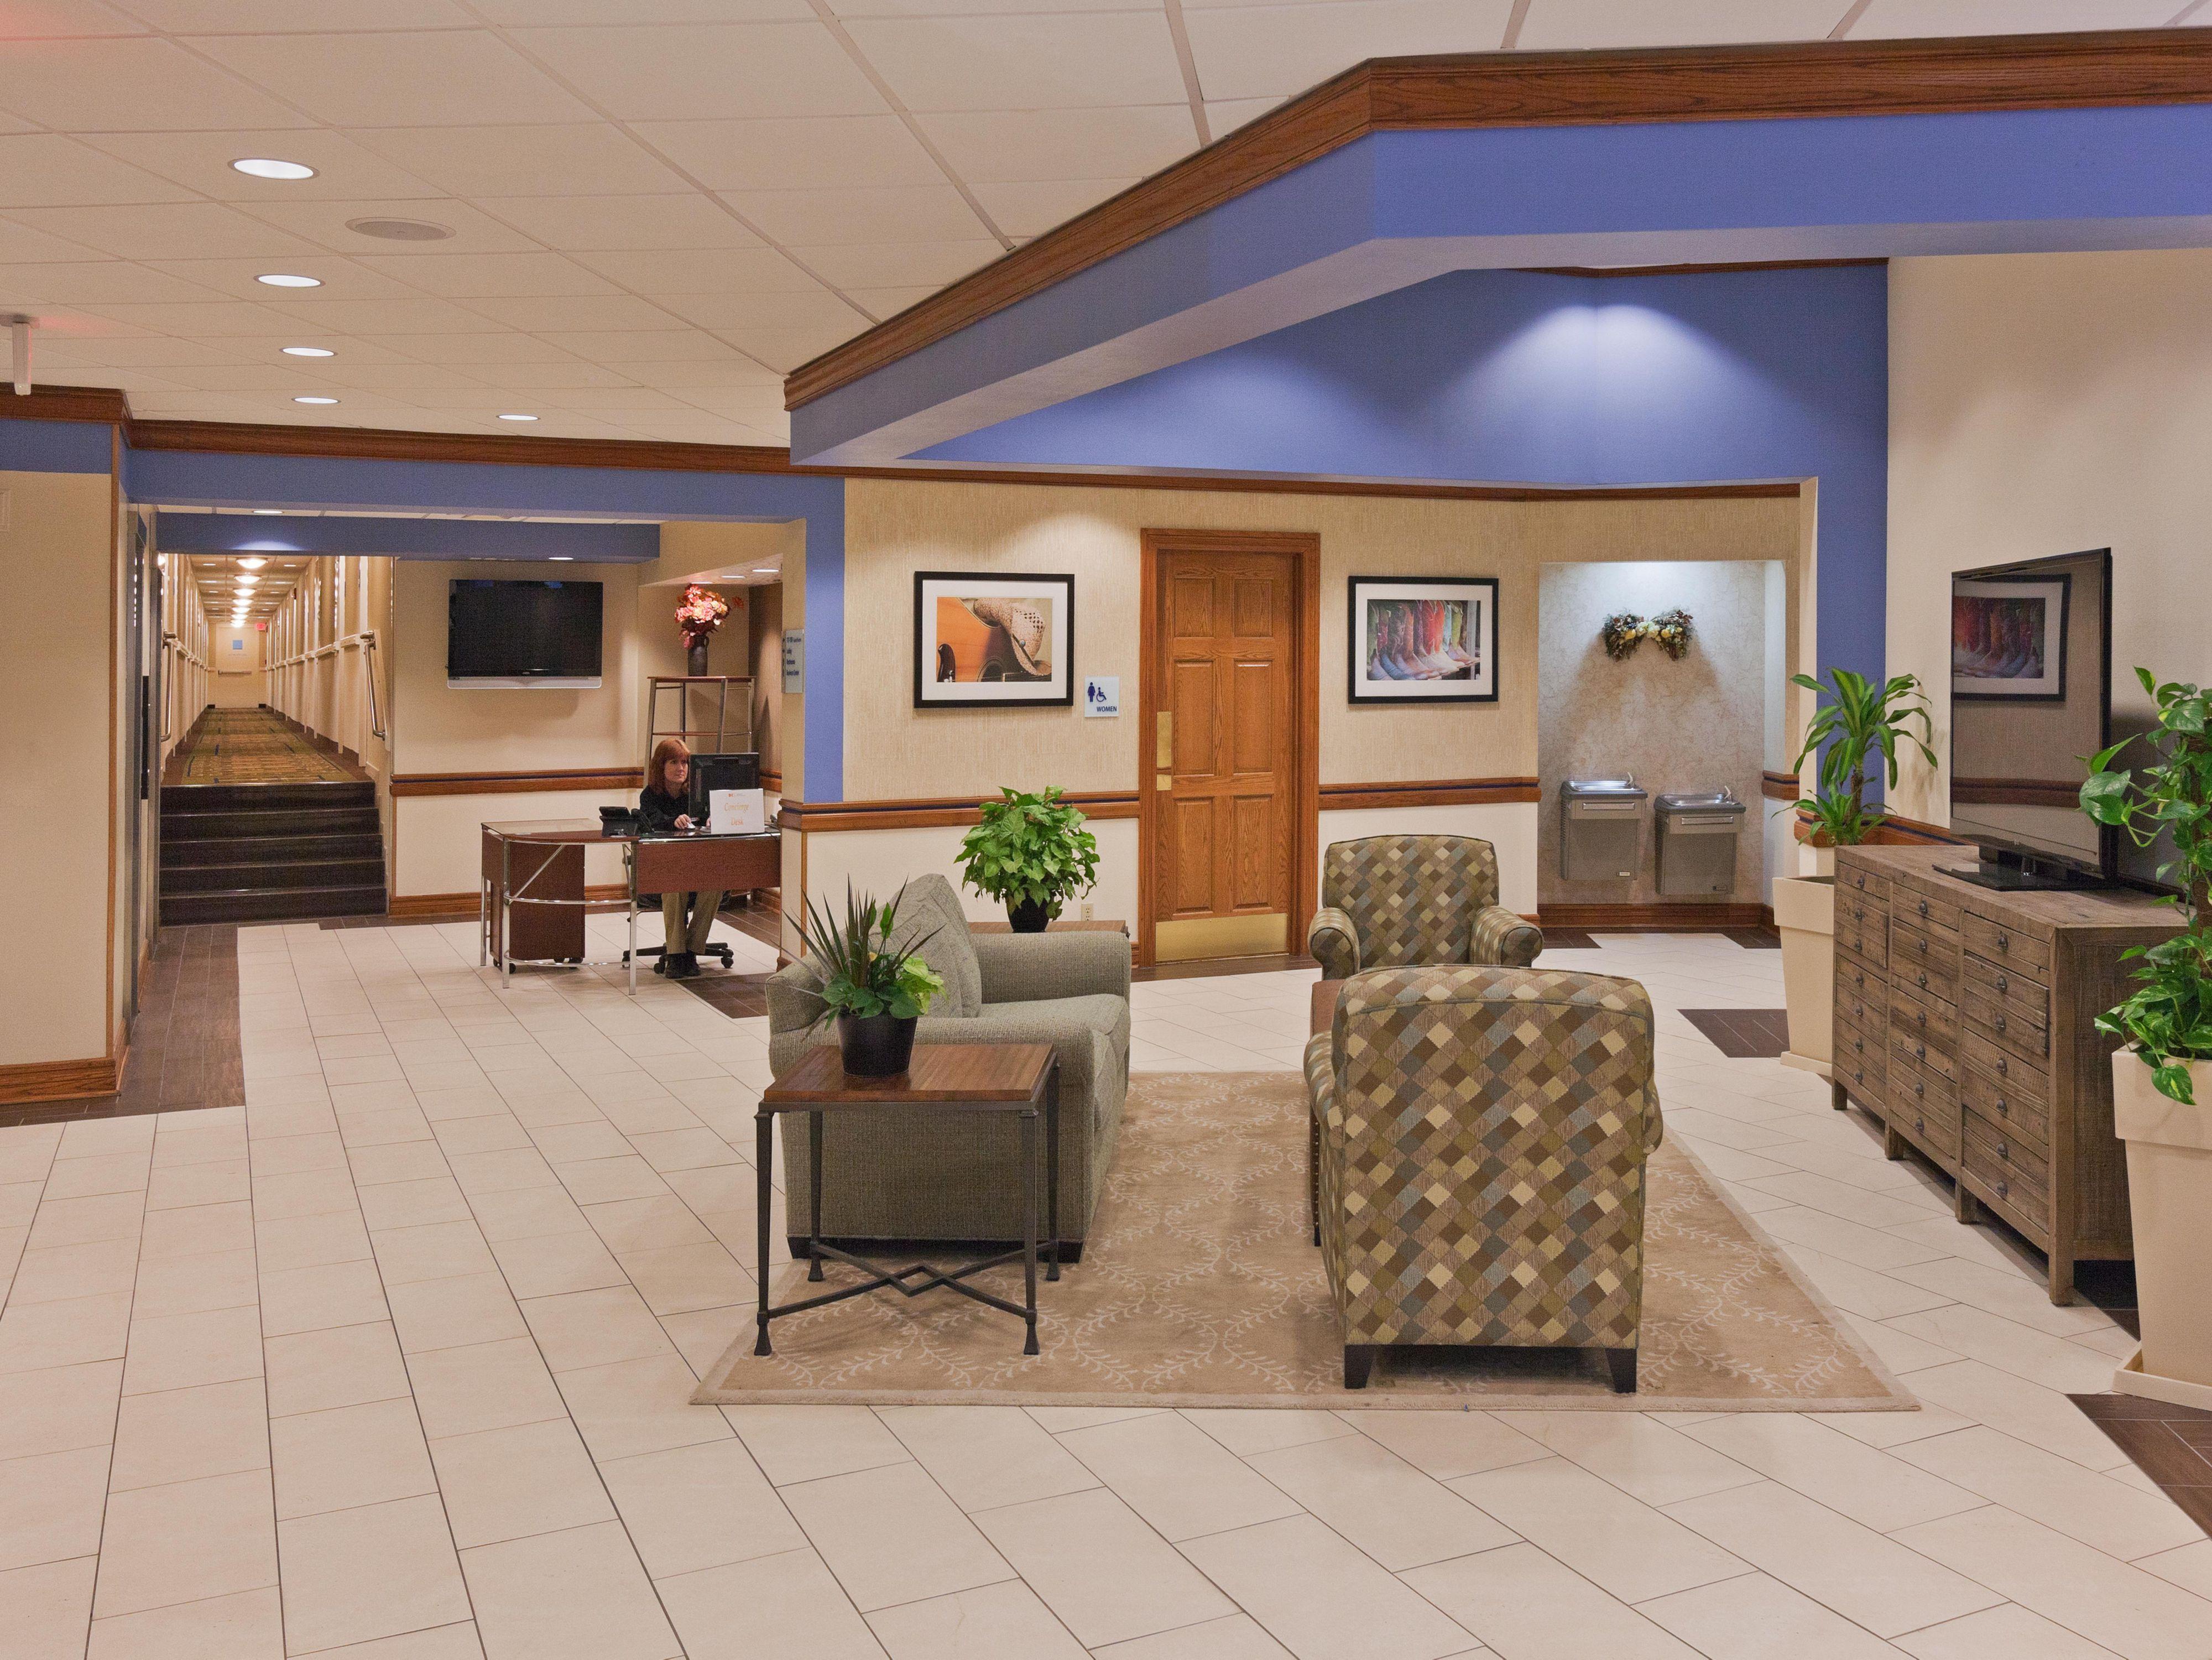 Holiday Inn Express Allin Aultman Hall On Fort Sill An